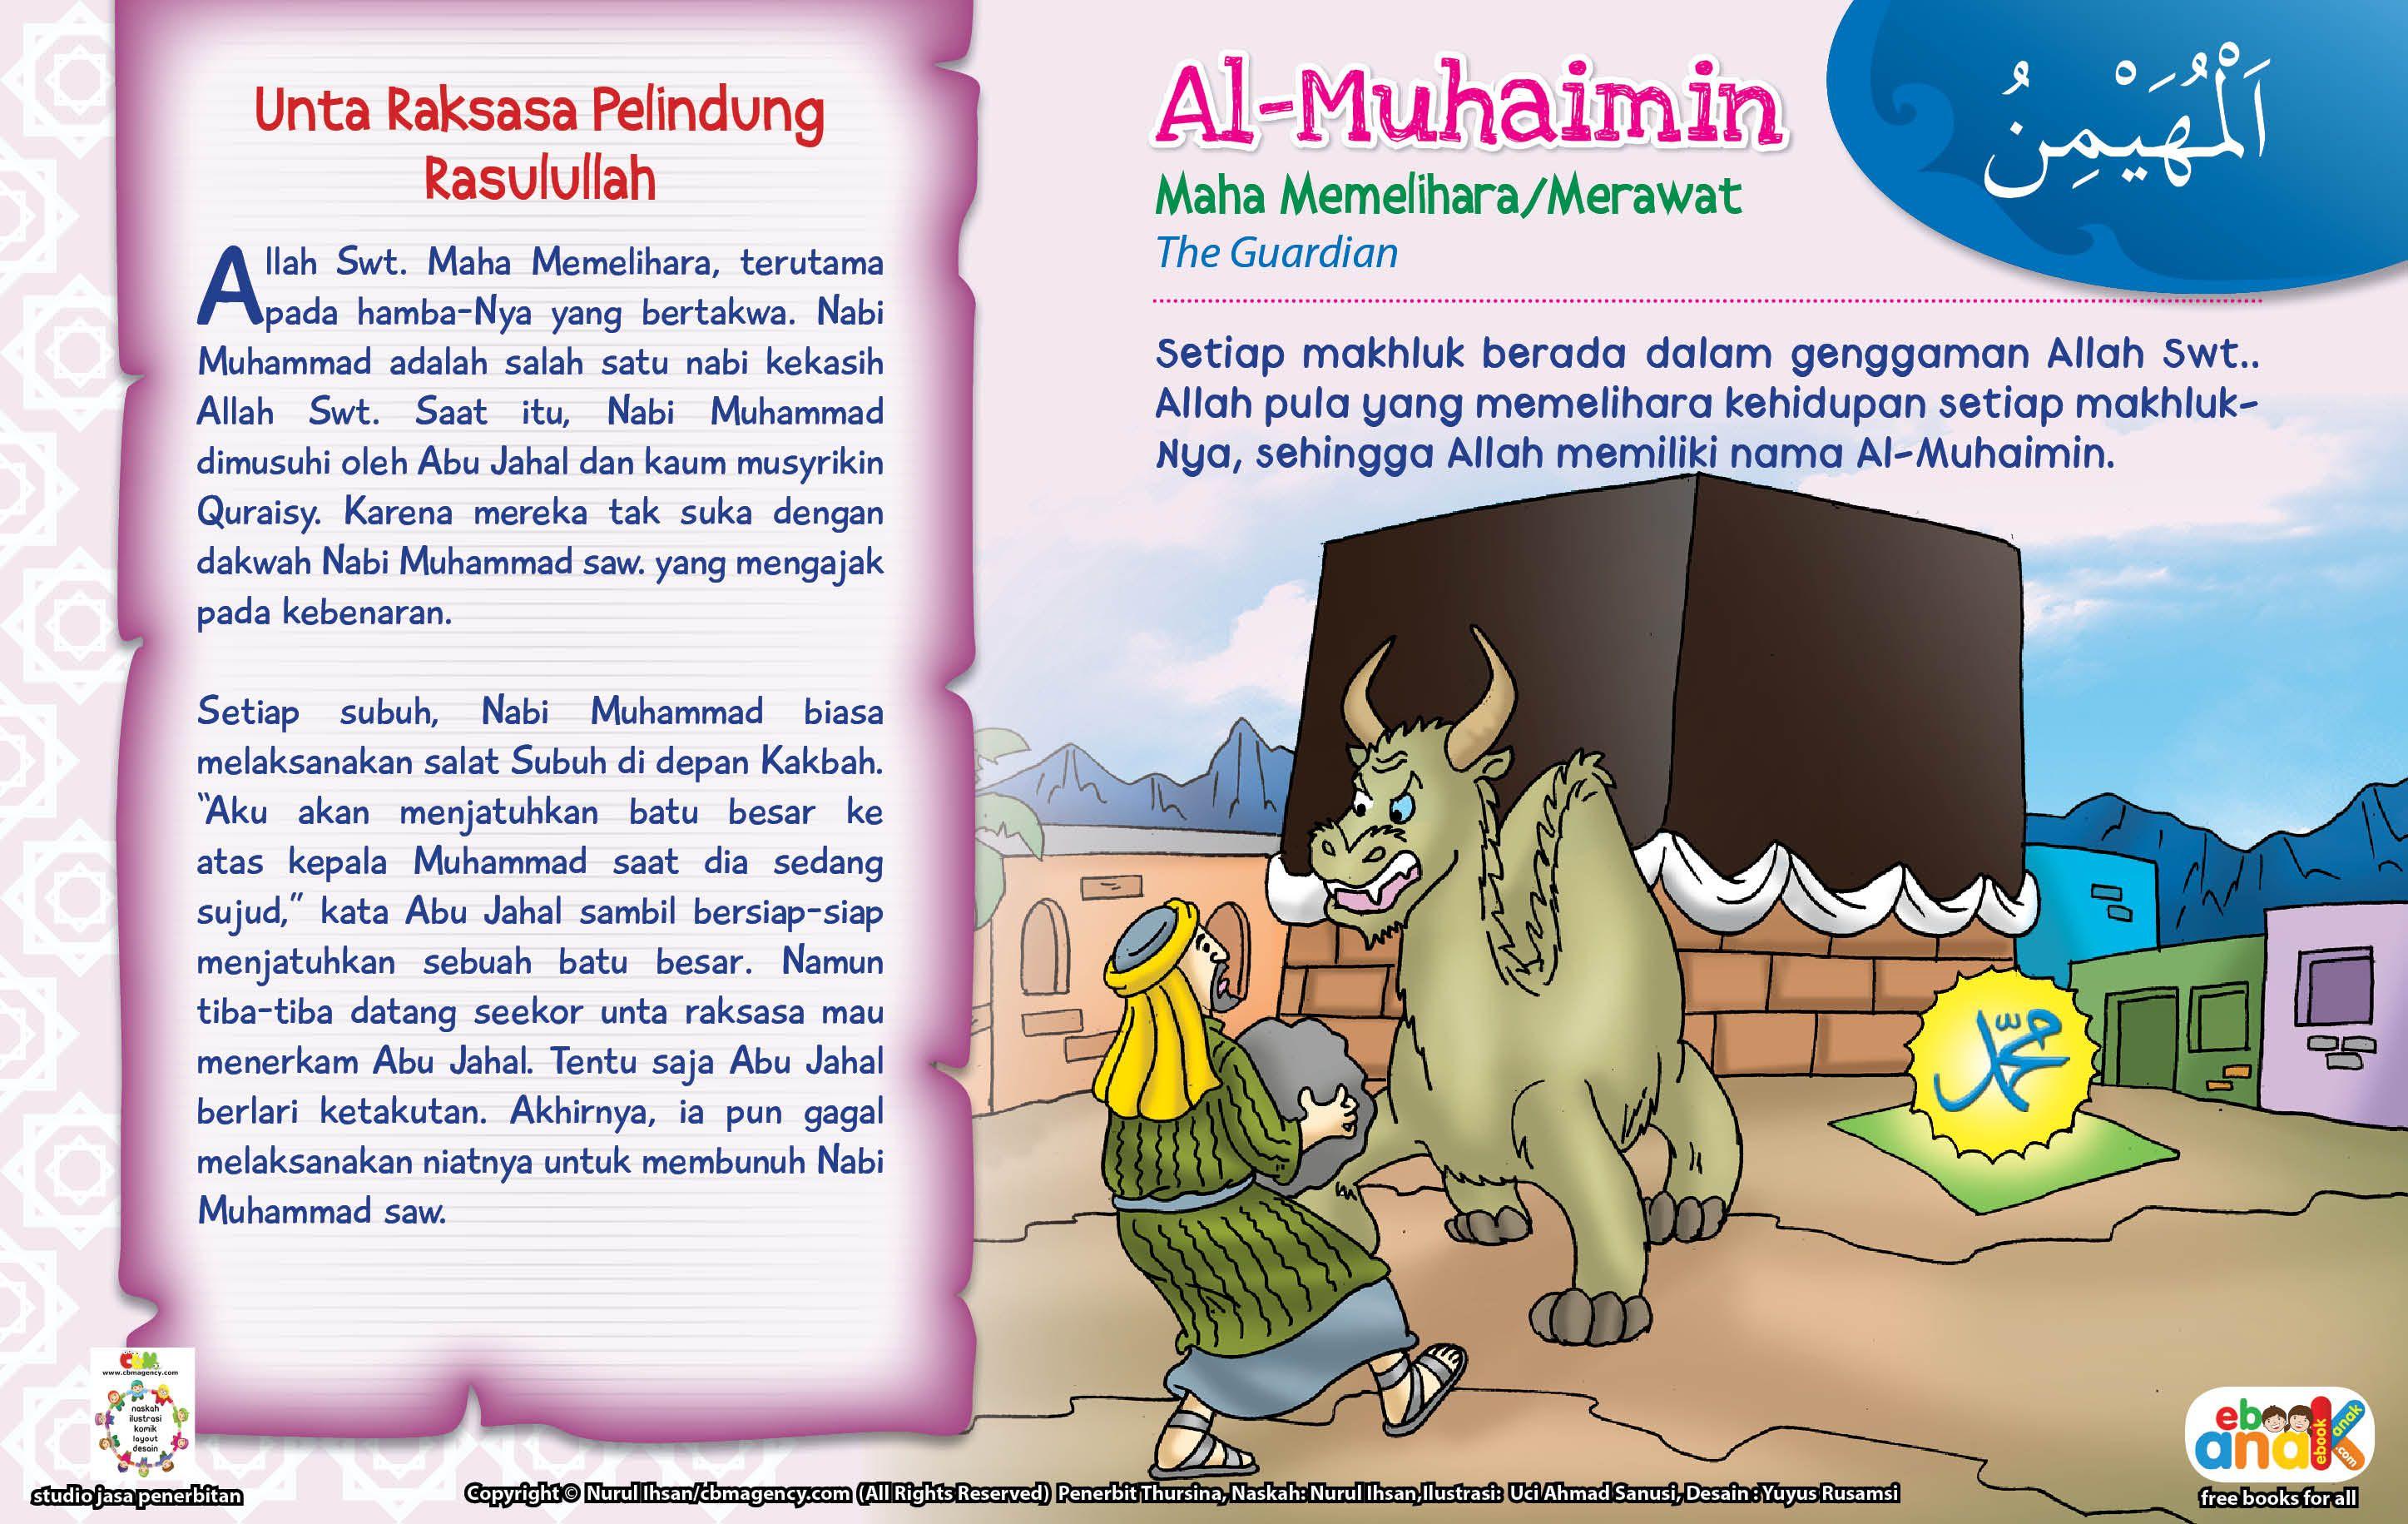 Kisah Asmaul Husna AlMuhaimin Anak, Buku, Allah